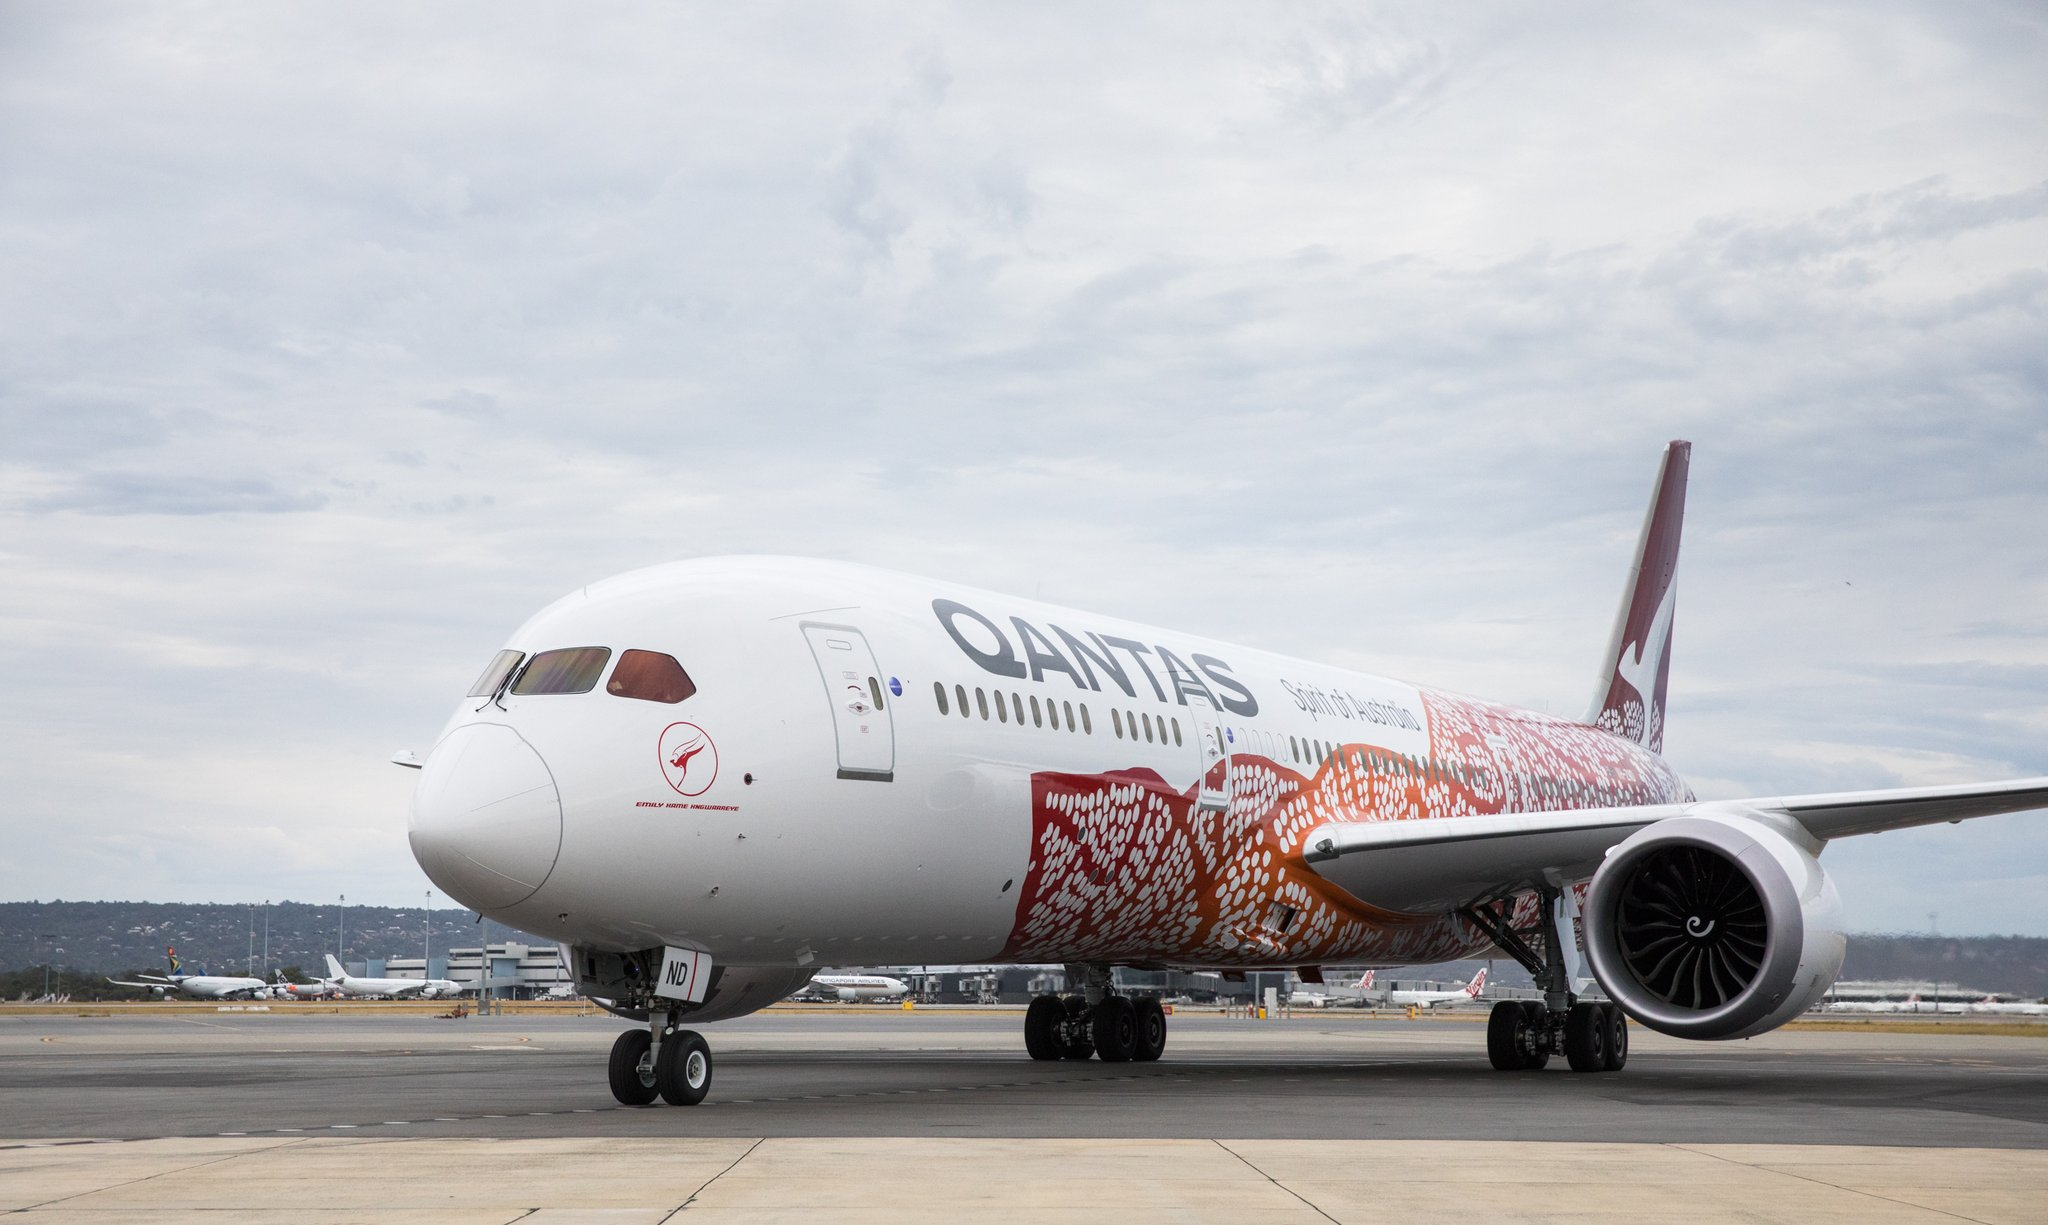 Qantas Airways Boeing 787-9 Dreamliner. Registrering VH-ZMD. (Foto: Qantas)